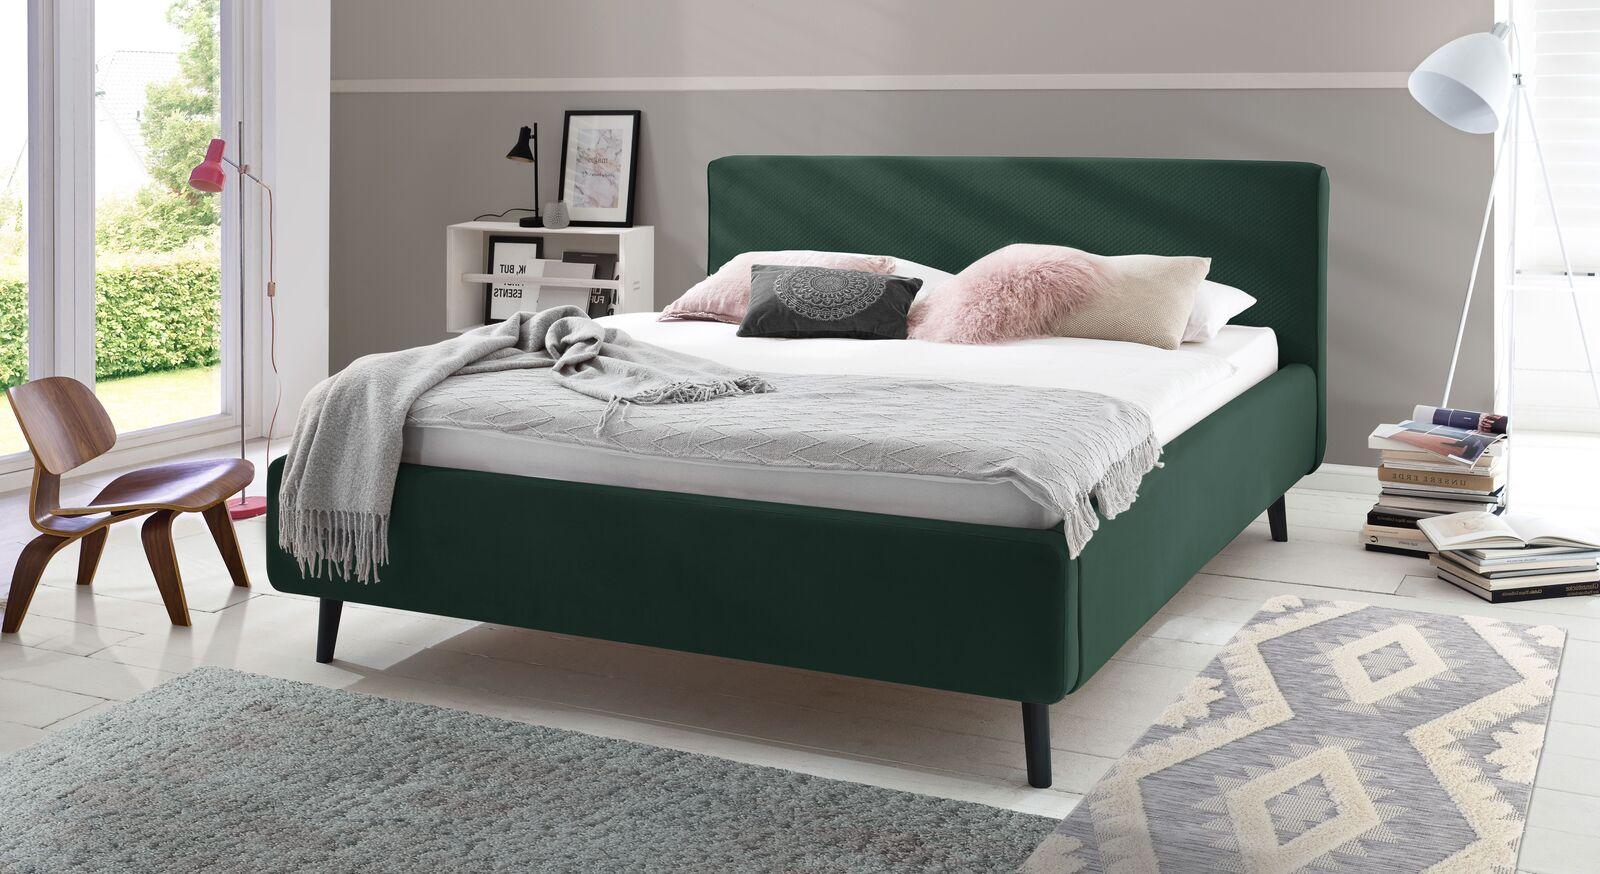 Bett Inara mit dunkelgrünem Samtbezug